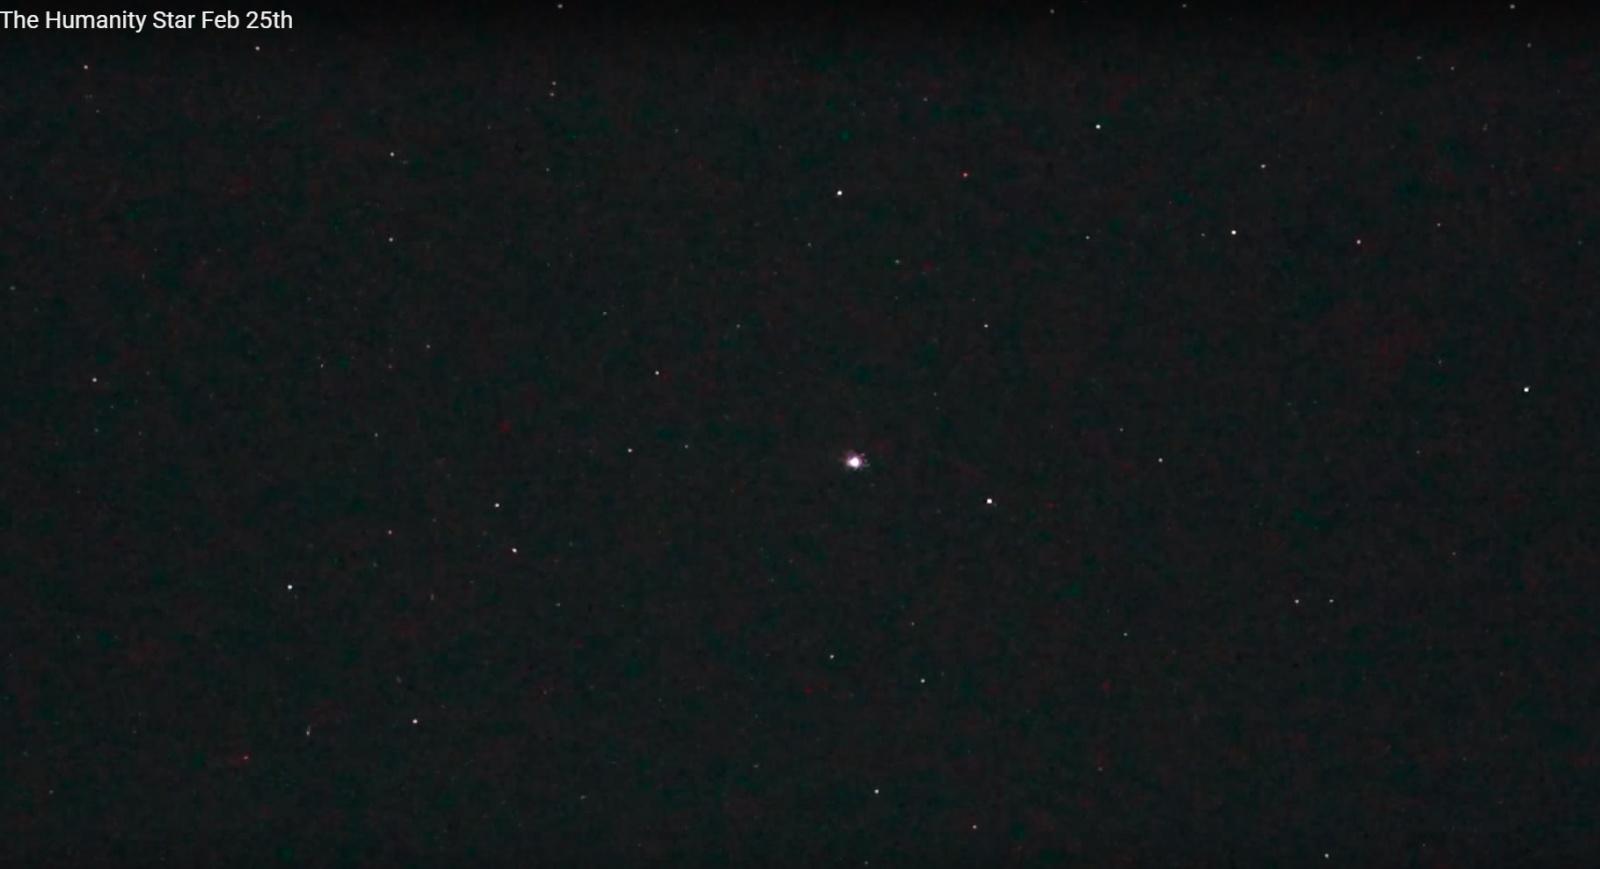 Облачно, вероятна неотключаемая реклама на звездном небе - 10